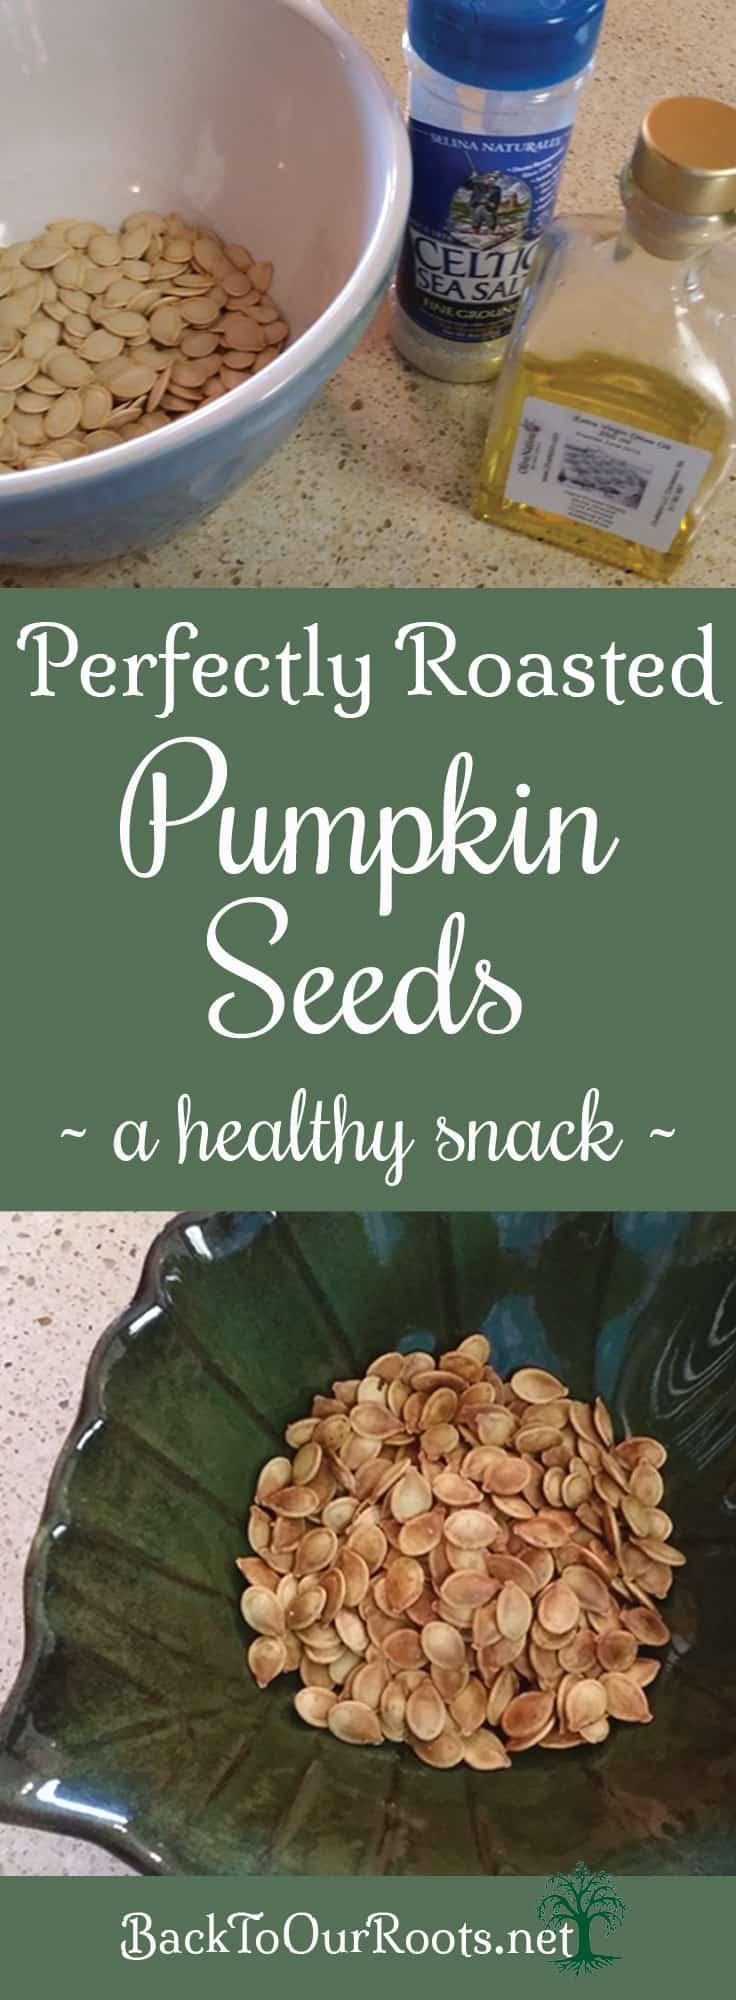 How To Perfectly Roast Pumpkin Seeds